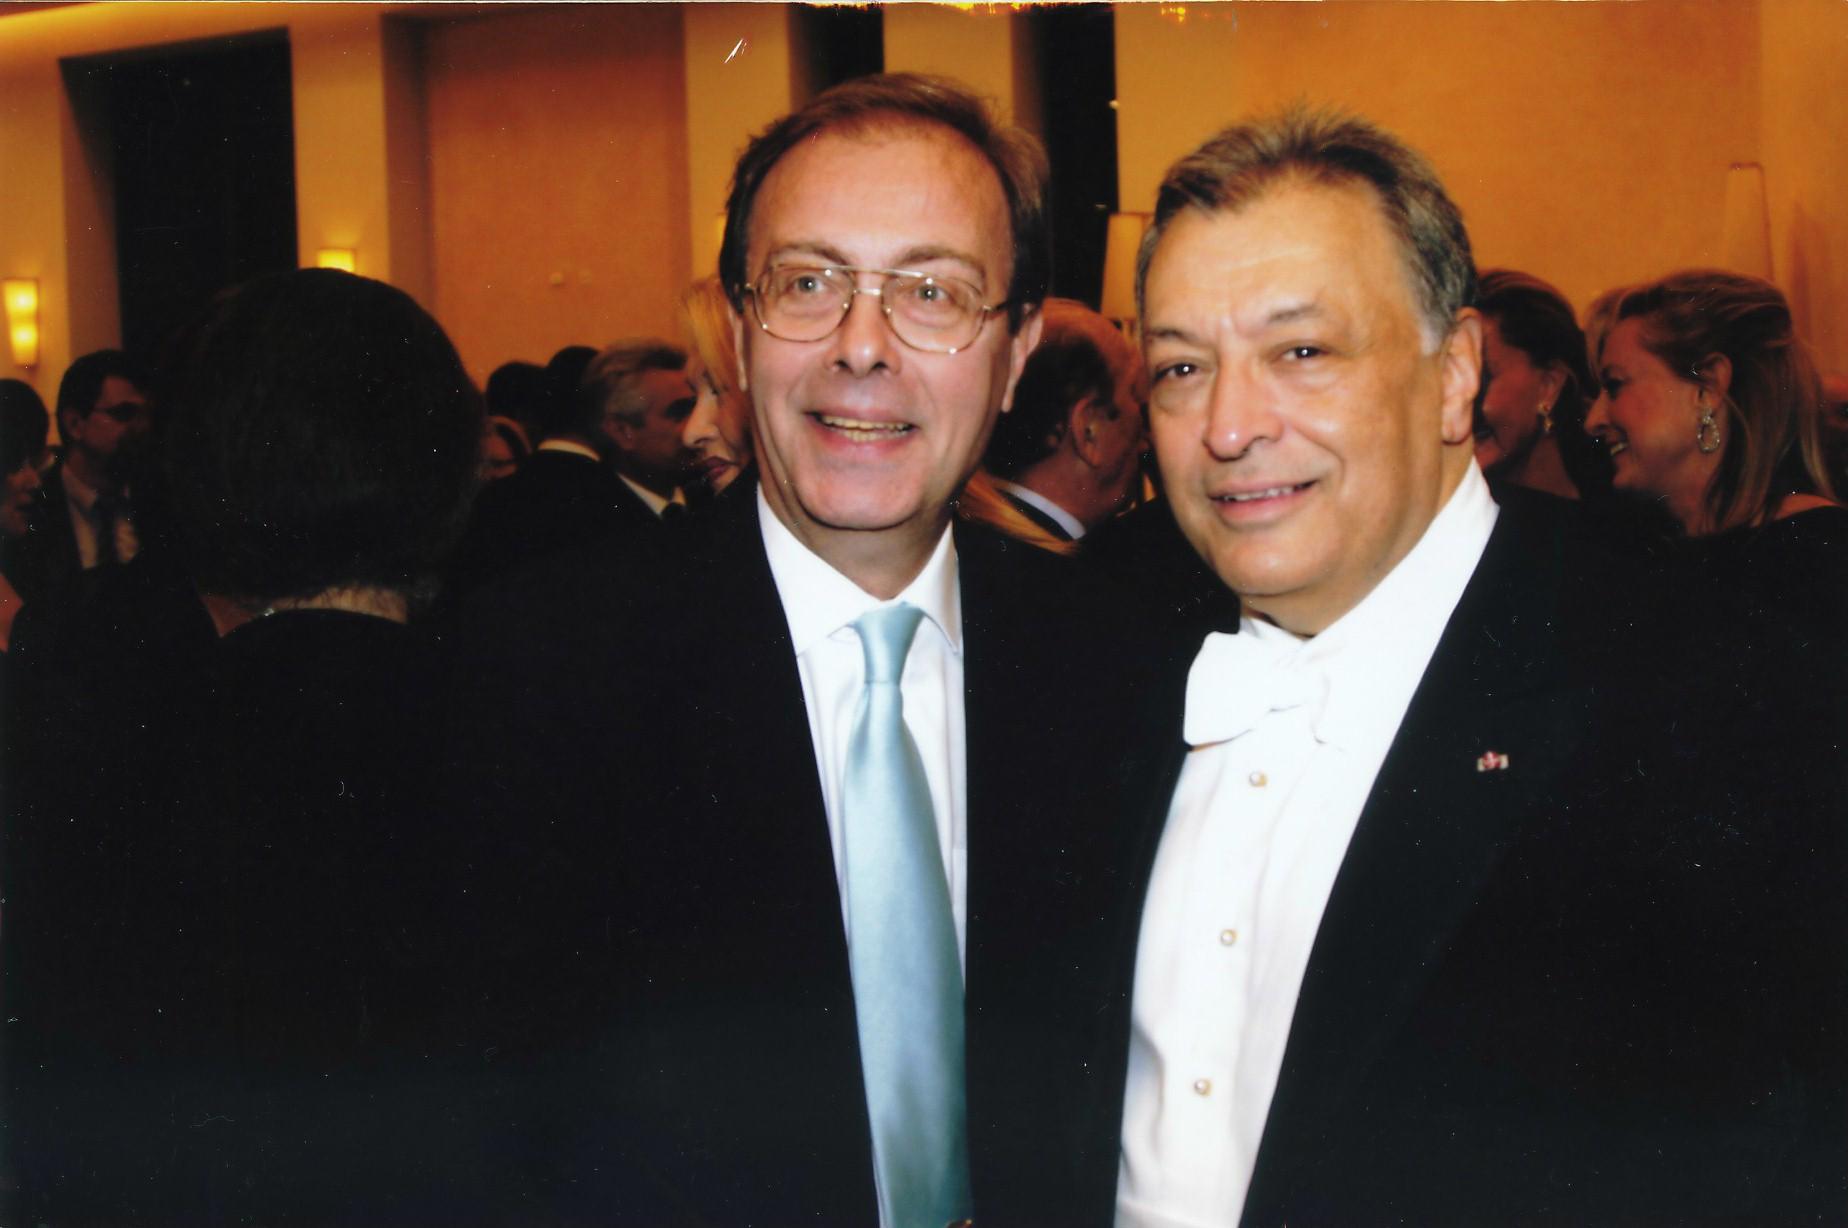 Vakarelis with Zubin Mehta